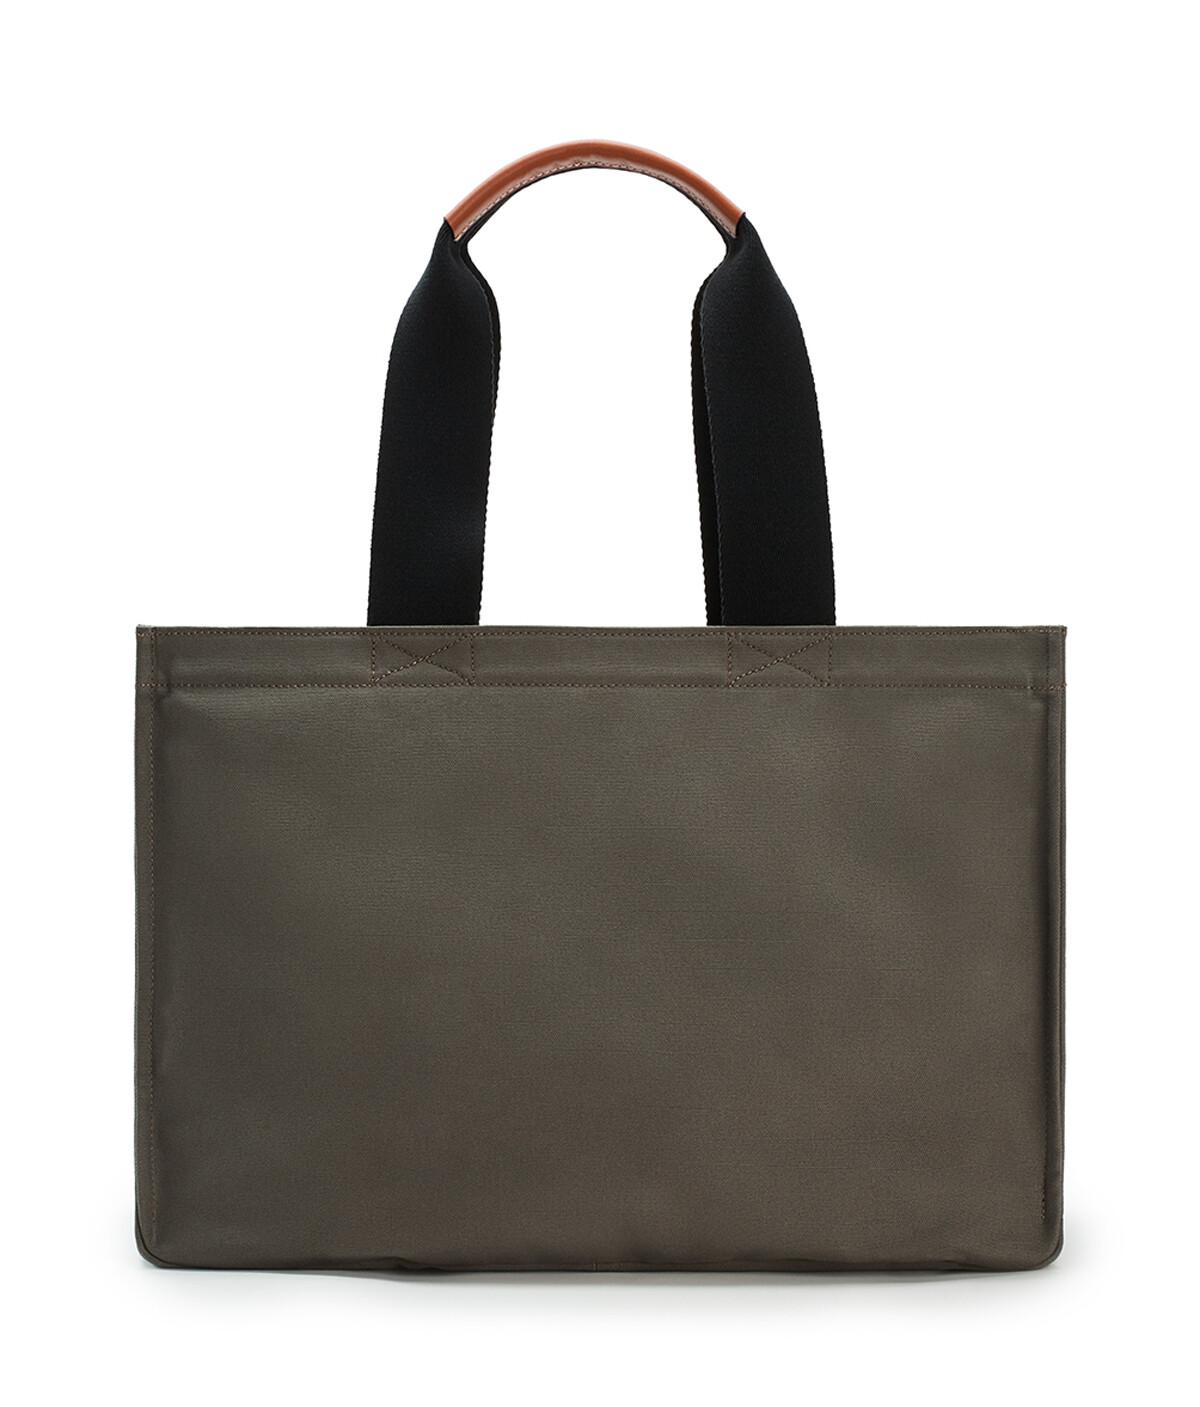 LOEWE Large Paula's Beach Cabas Bag In Canvas Khaki Green front